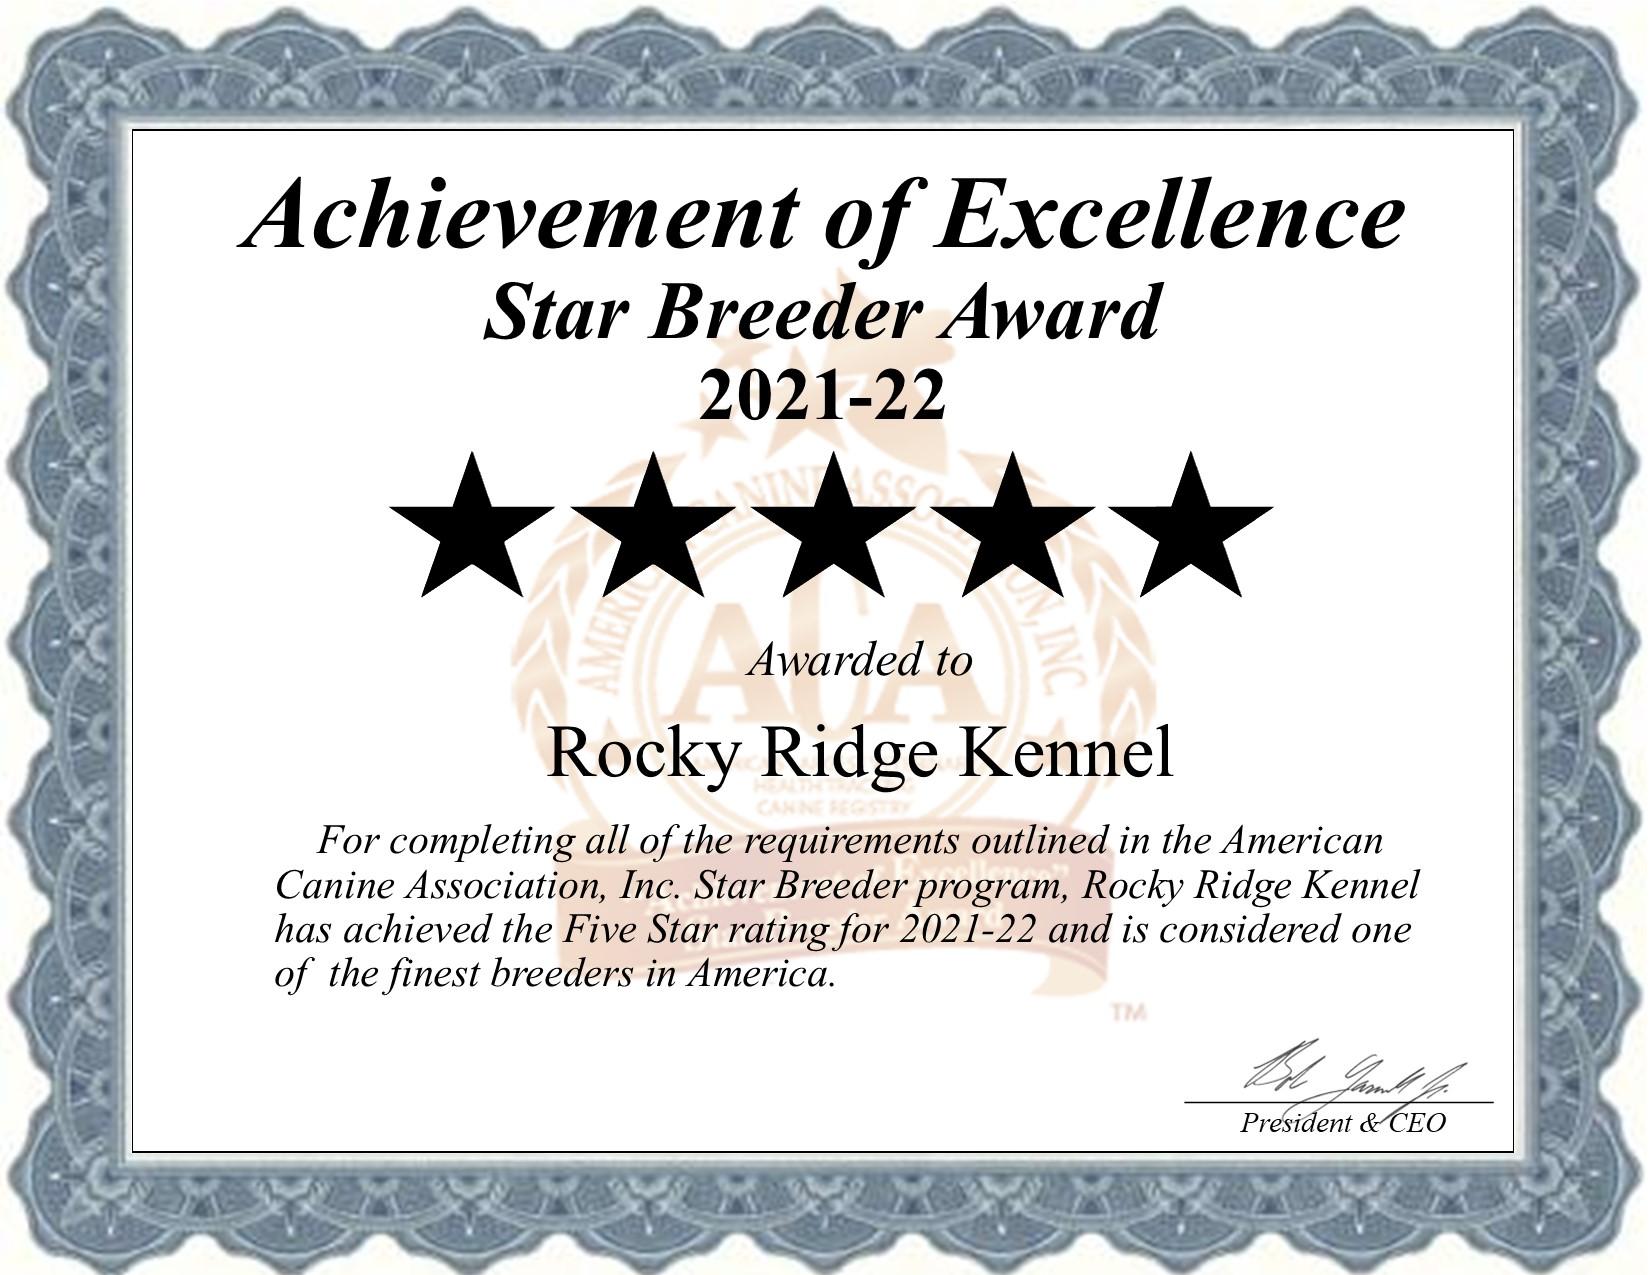 Rocky, Ridge, dog, breeder, star, certificate, Rocky-Ridge, Denver, PA, Pennsylvania, puppy, dog, kennels, mill, puppymill, usda, 5-star, aca, ica, registered, cocker, spaniel, maltese, 2021-22